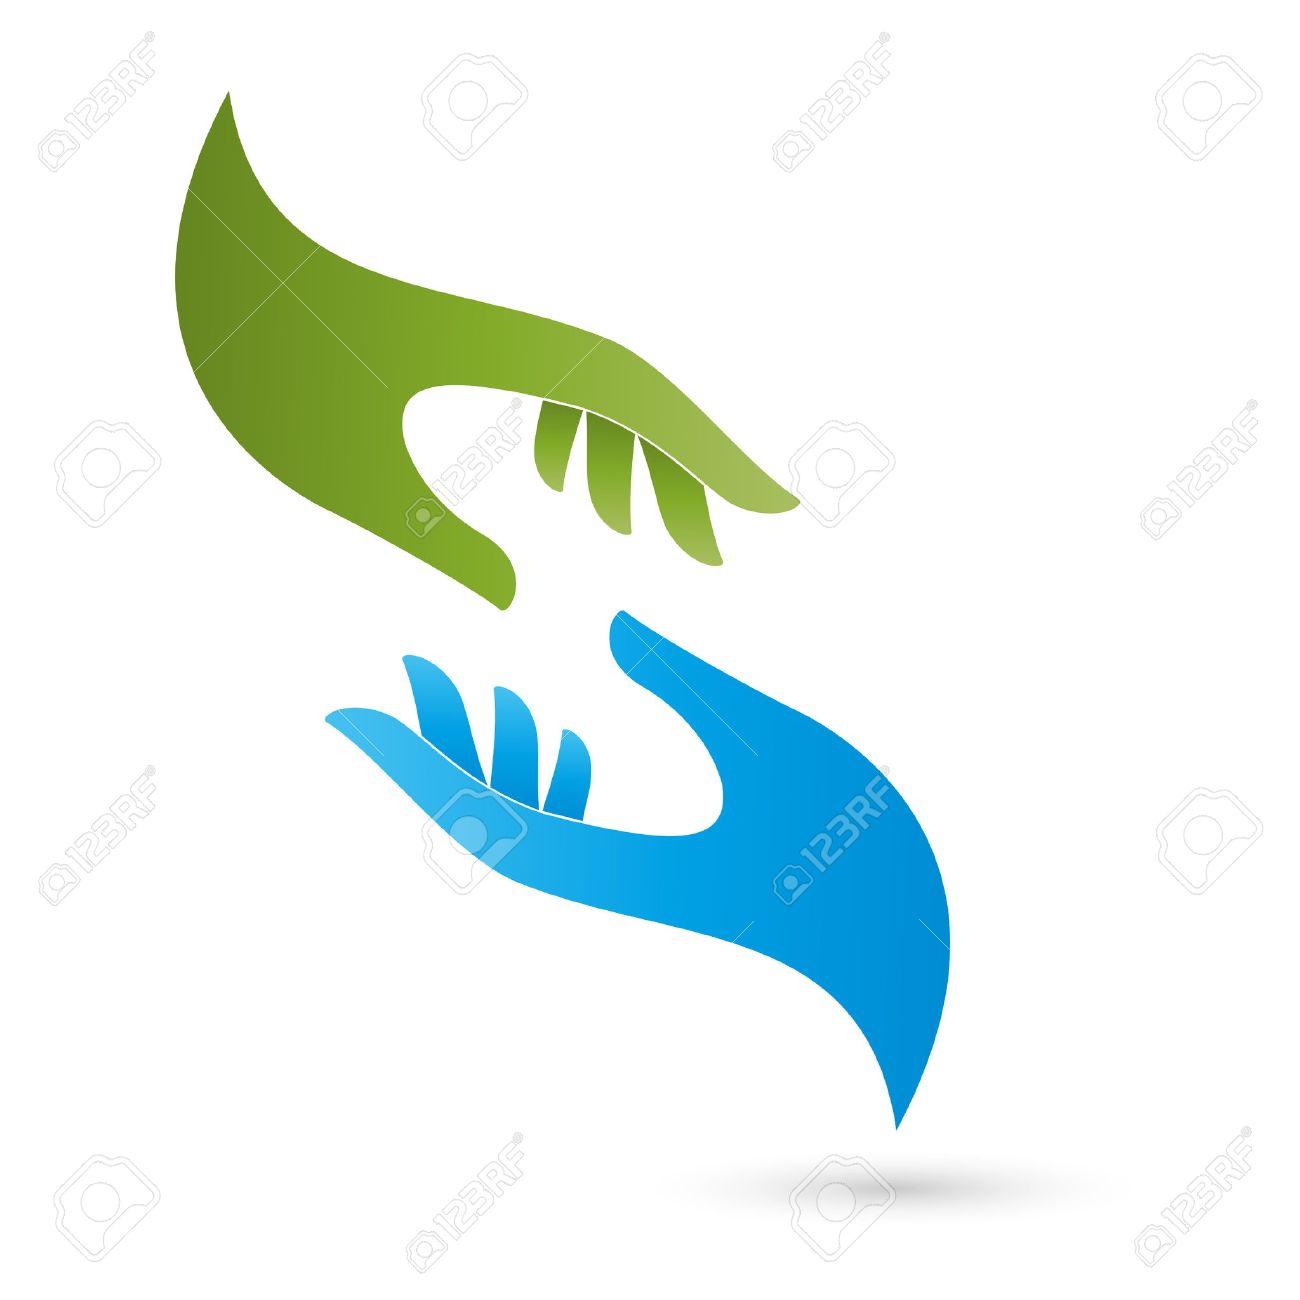 Two hands logo, pastoral care, massage - 43688171